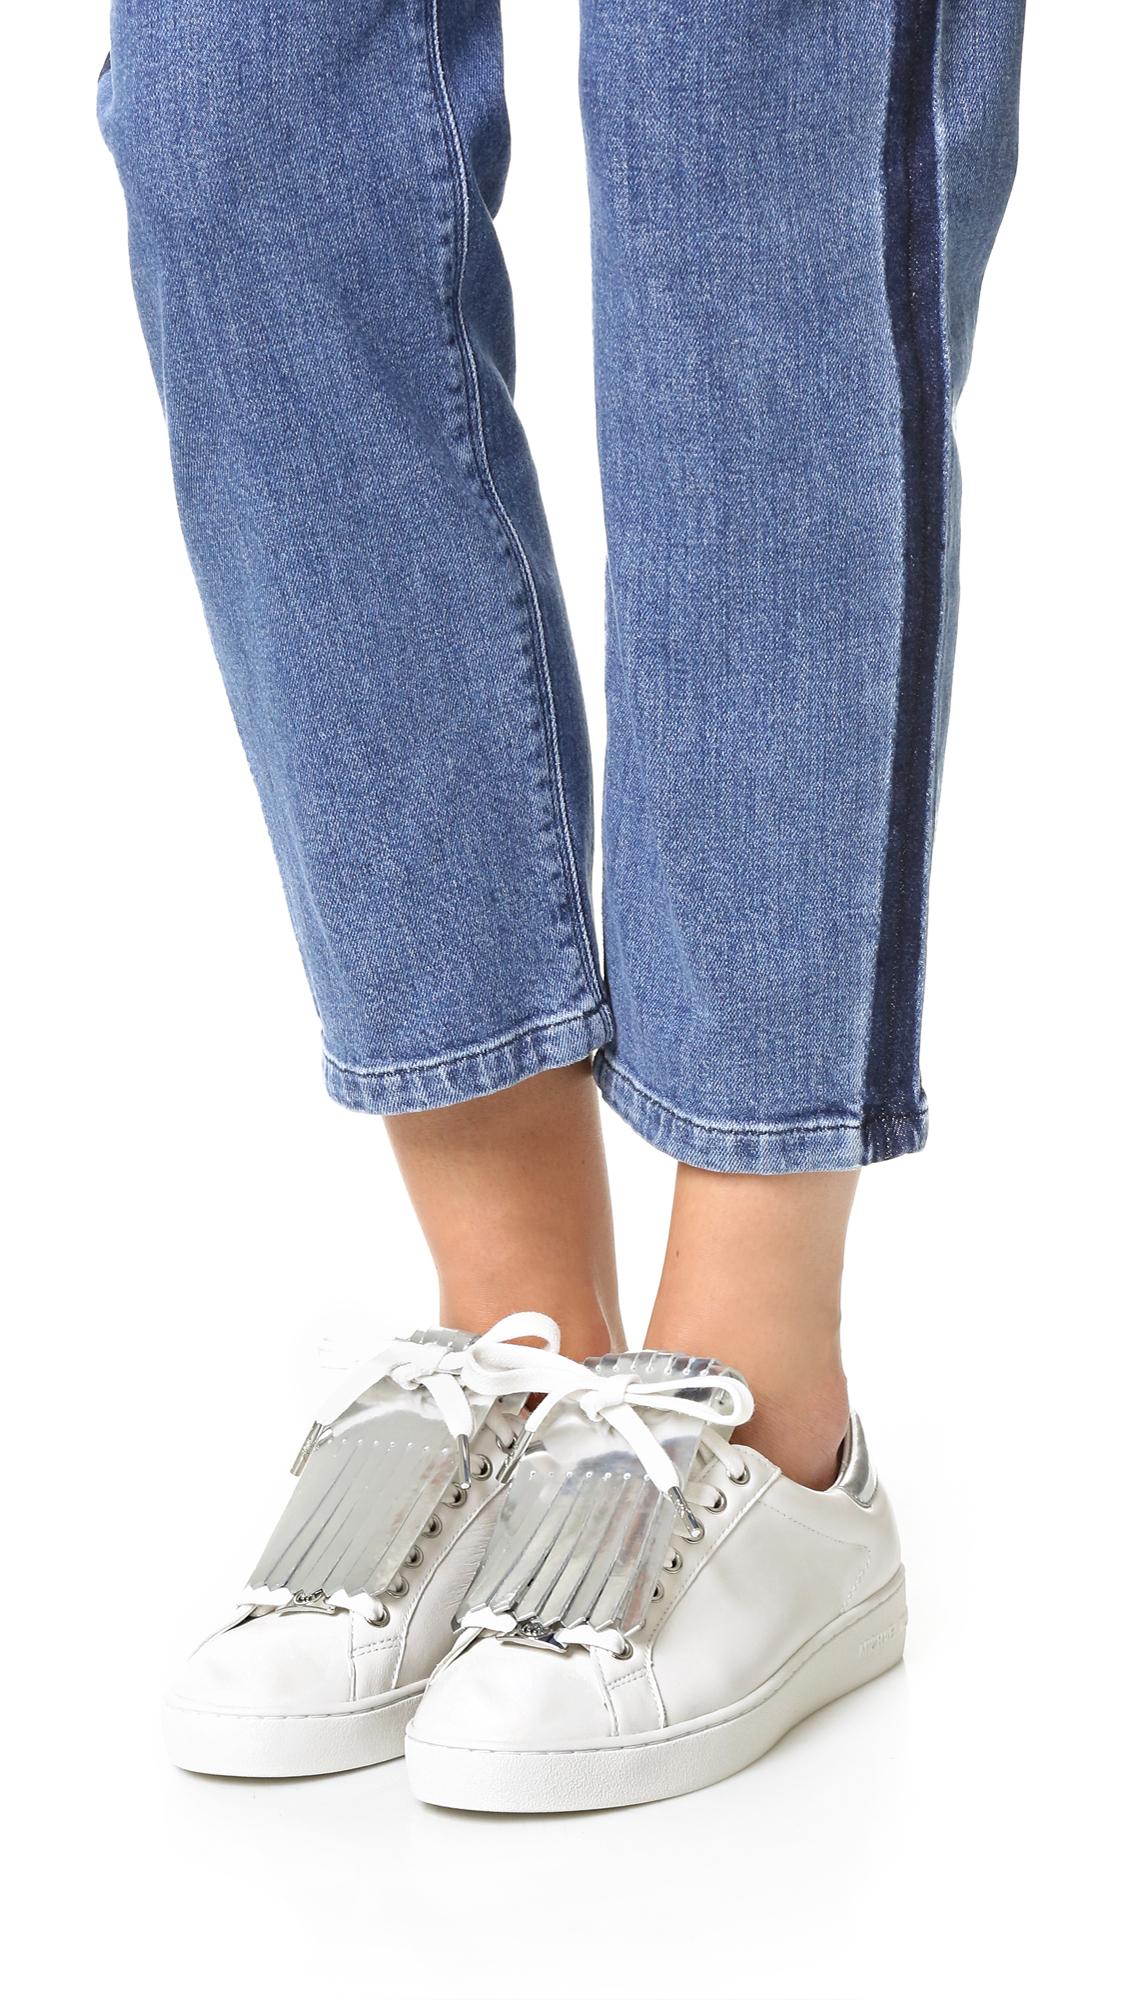 2a608750c96c0 MICHAEL Michael Kors Keaton Kiltie Sneakers